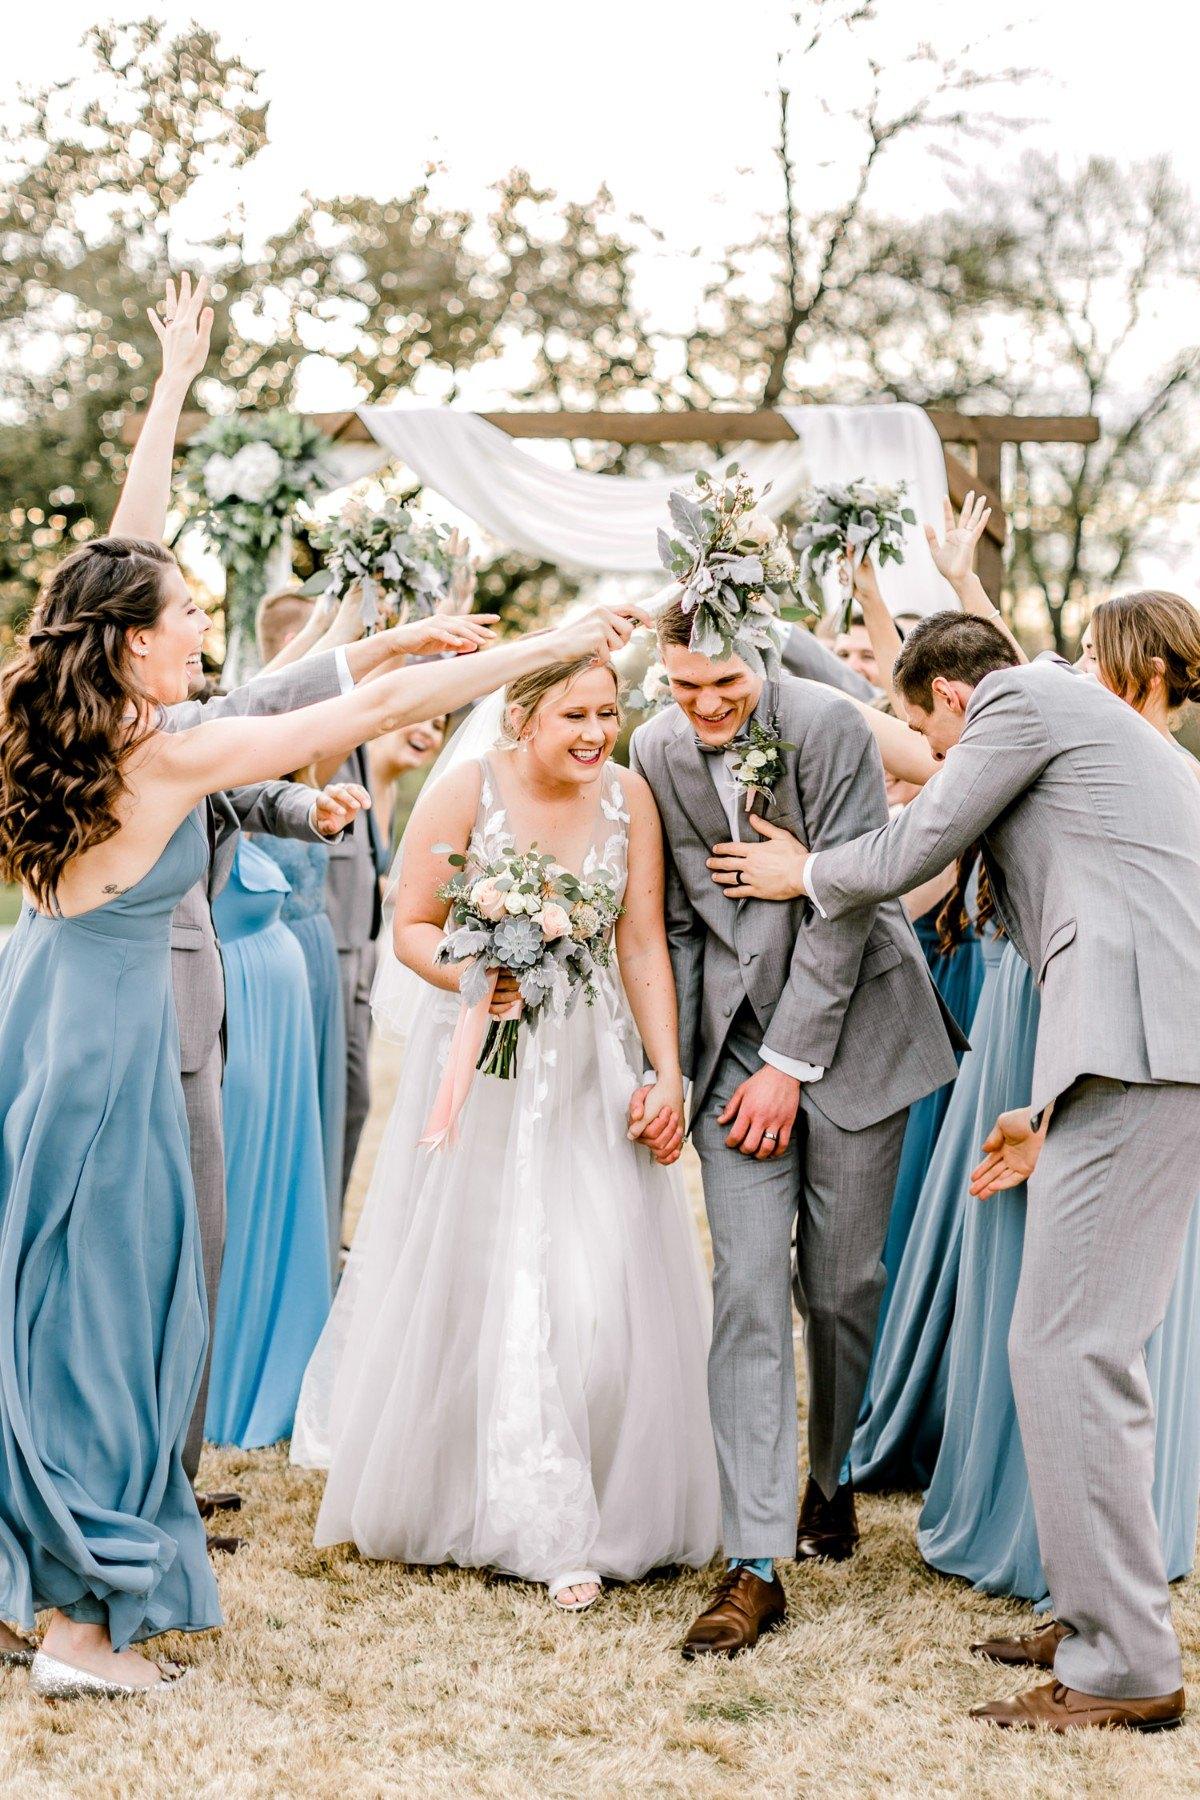 ennis-texas-wedding-photographer-kaitlyn-bullard-91.jpg